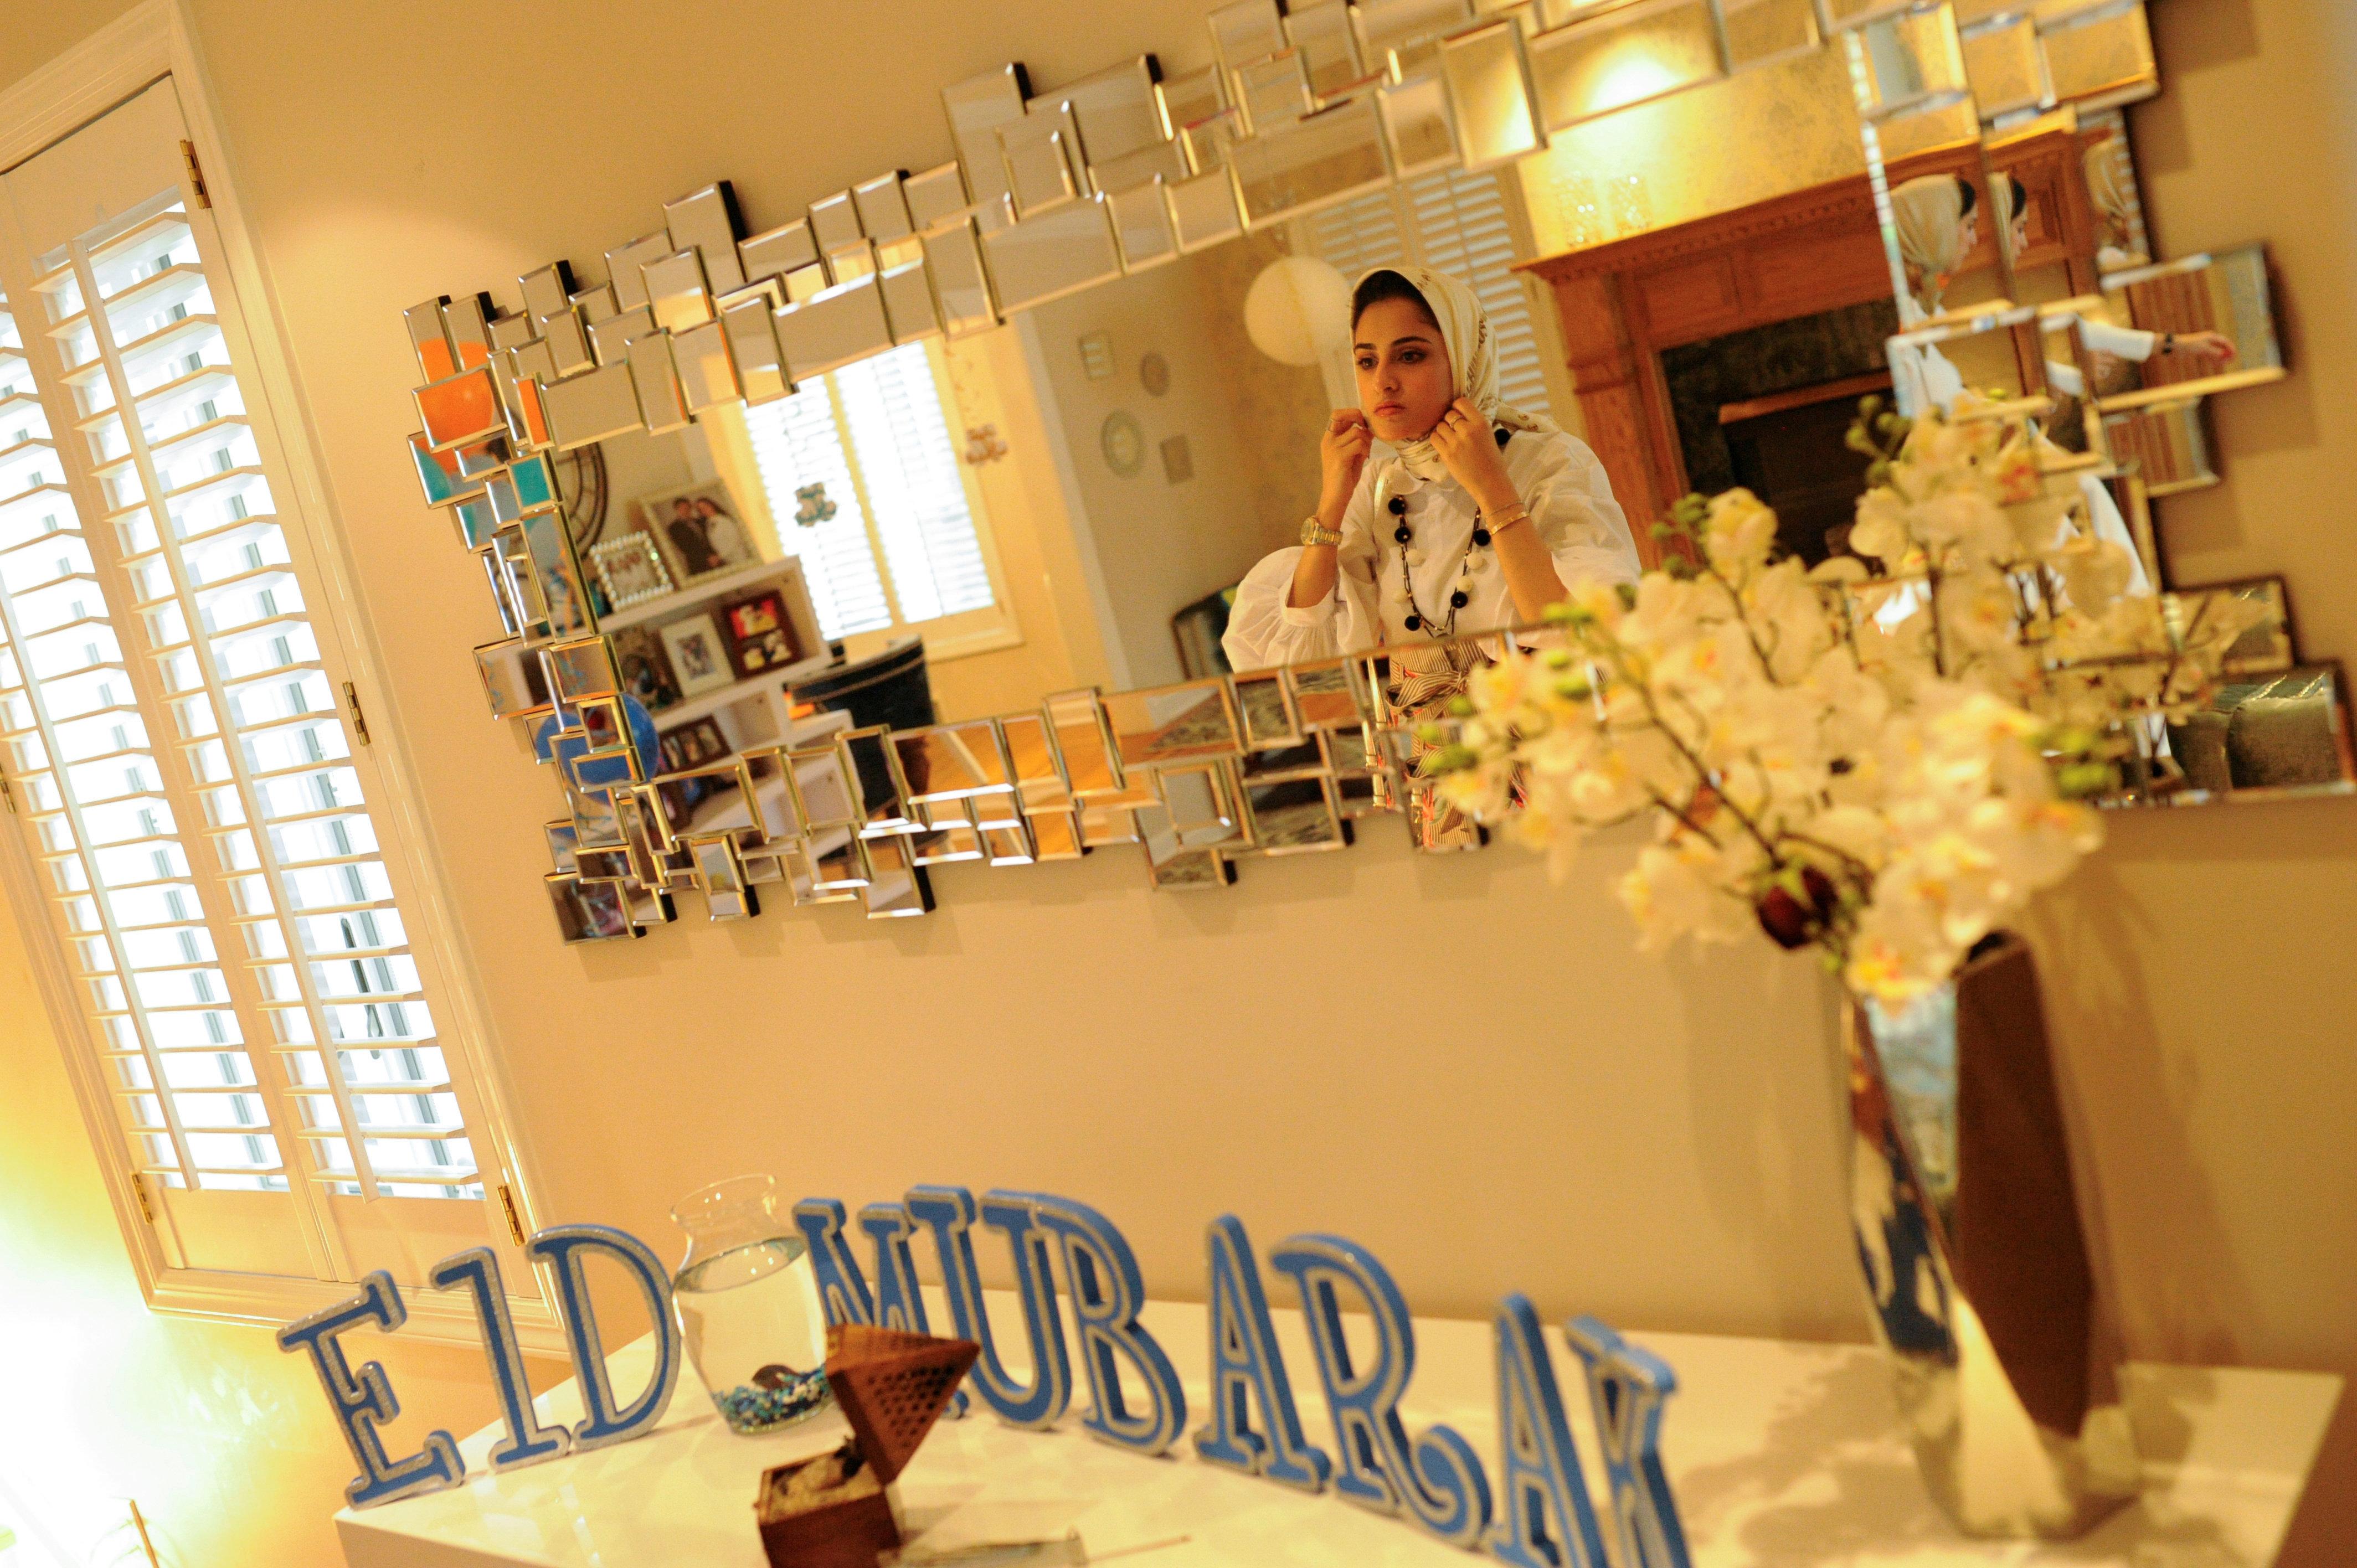 Great Room Eid Al-Fitr Decorations - 5951140e1500001f00900216  You Should Have_783916 .jpeg?ops\u003dscalefit_970_noupscale